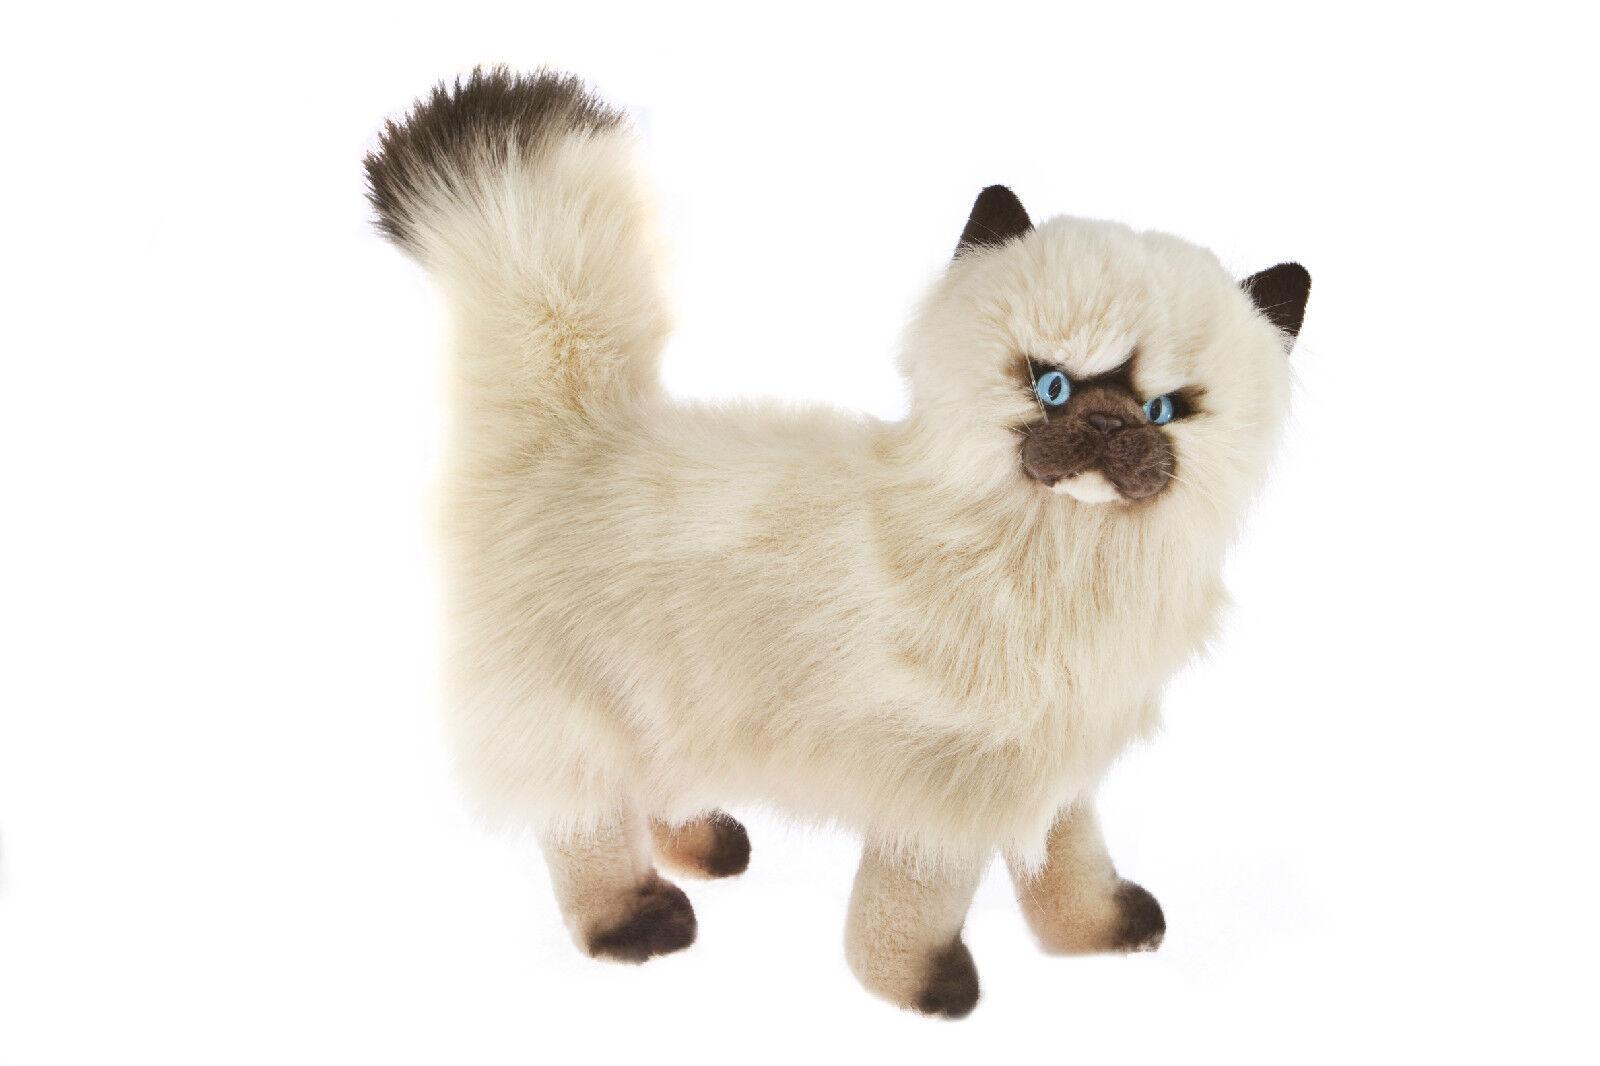 NEW STANDING HIMALAYAN TOY CAT KITTEN SOFT STUFFED PET PLUSH TOY HIMALAYAN 14inch 36cm a824ef